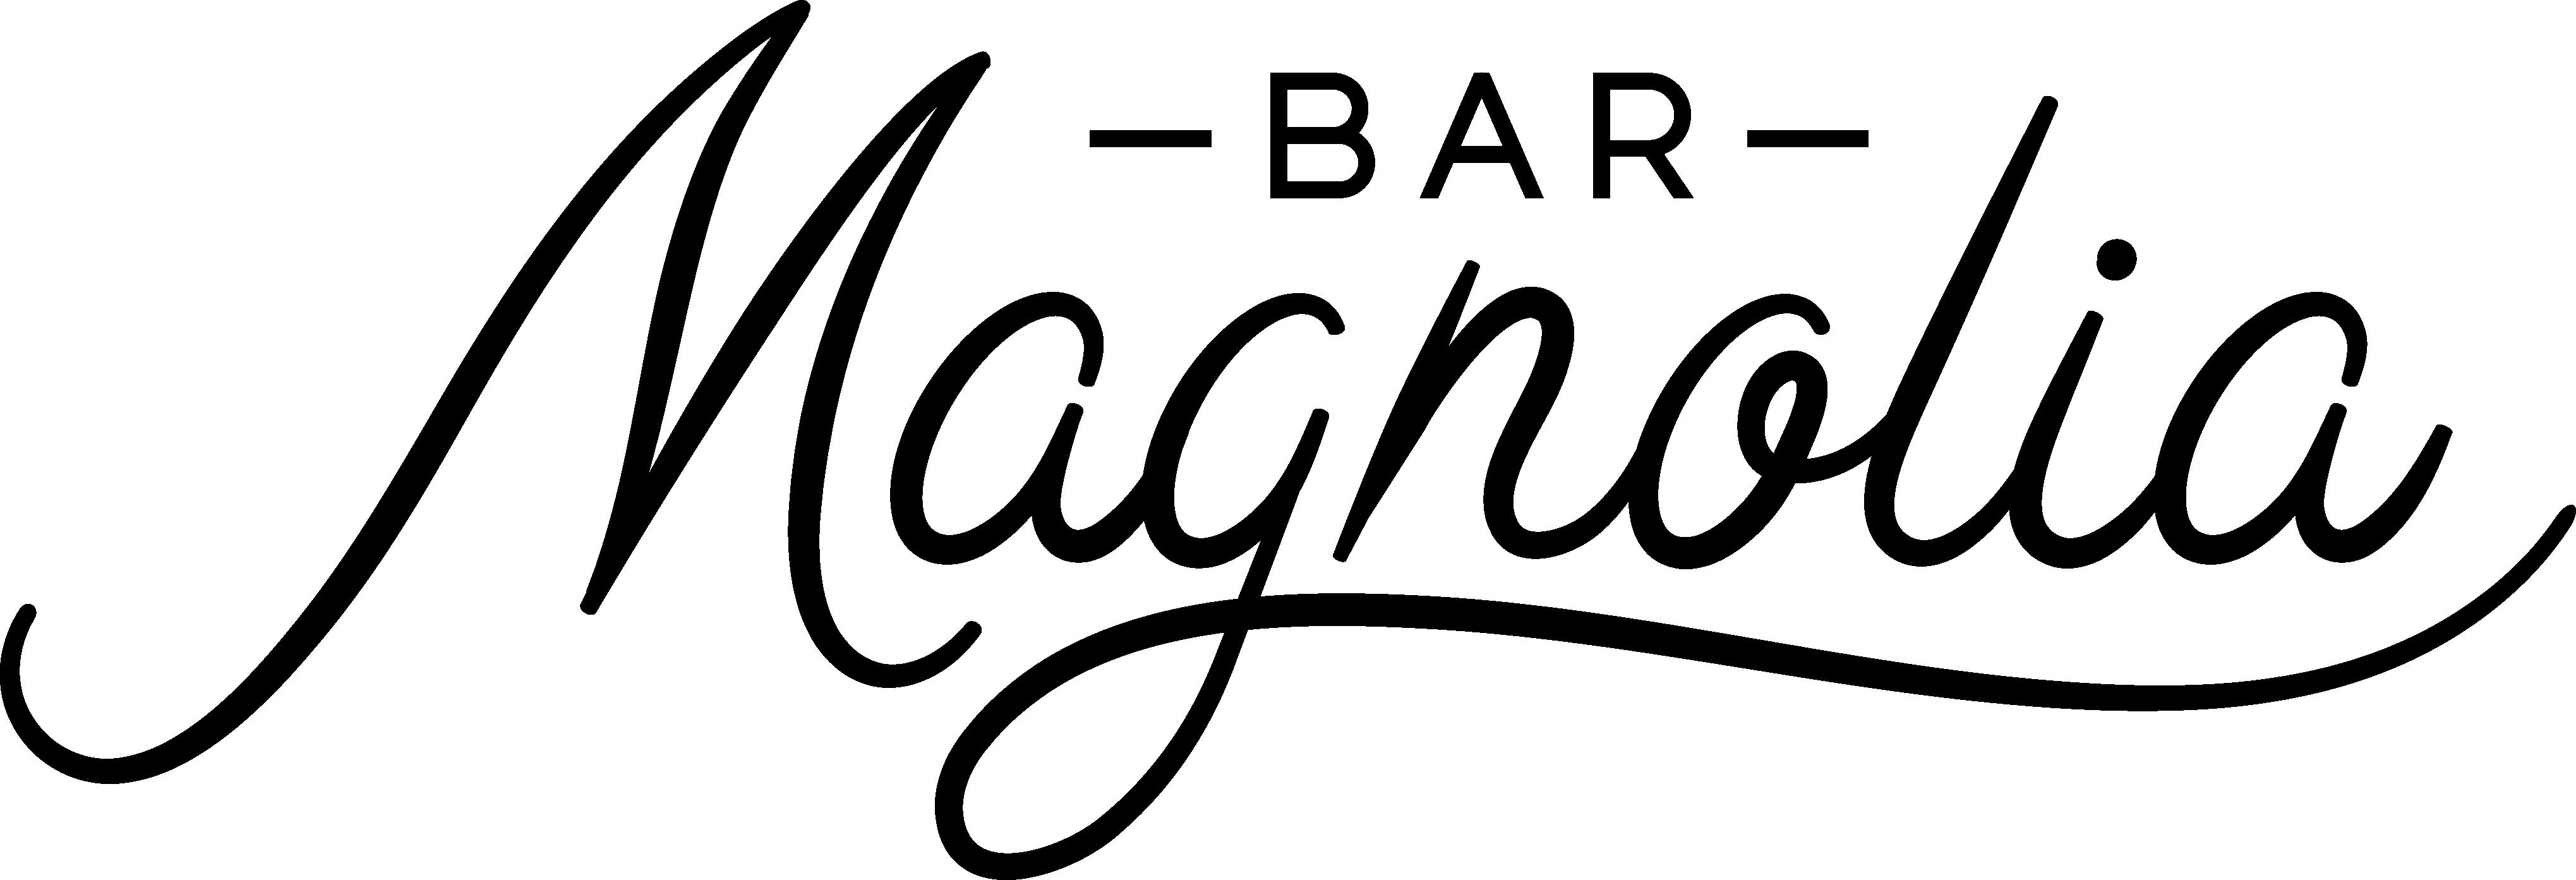 Bar Magnolia logo Black PNG